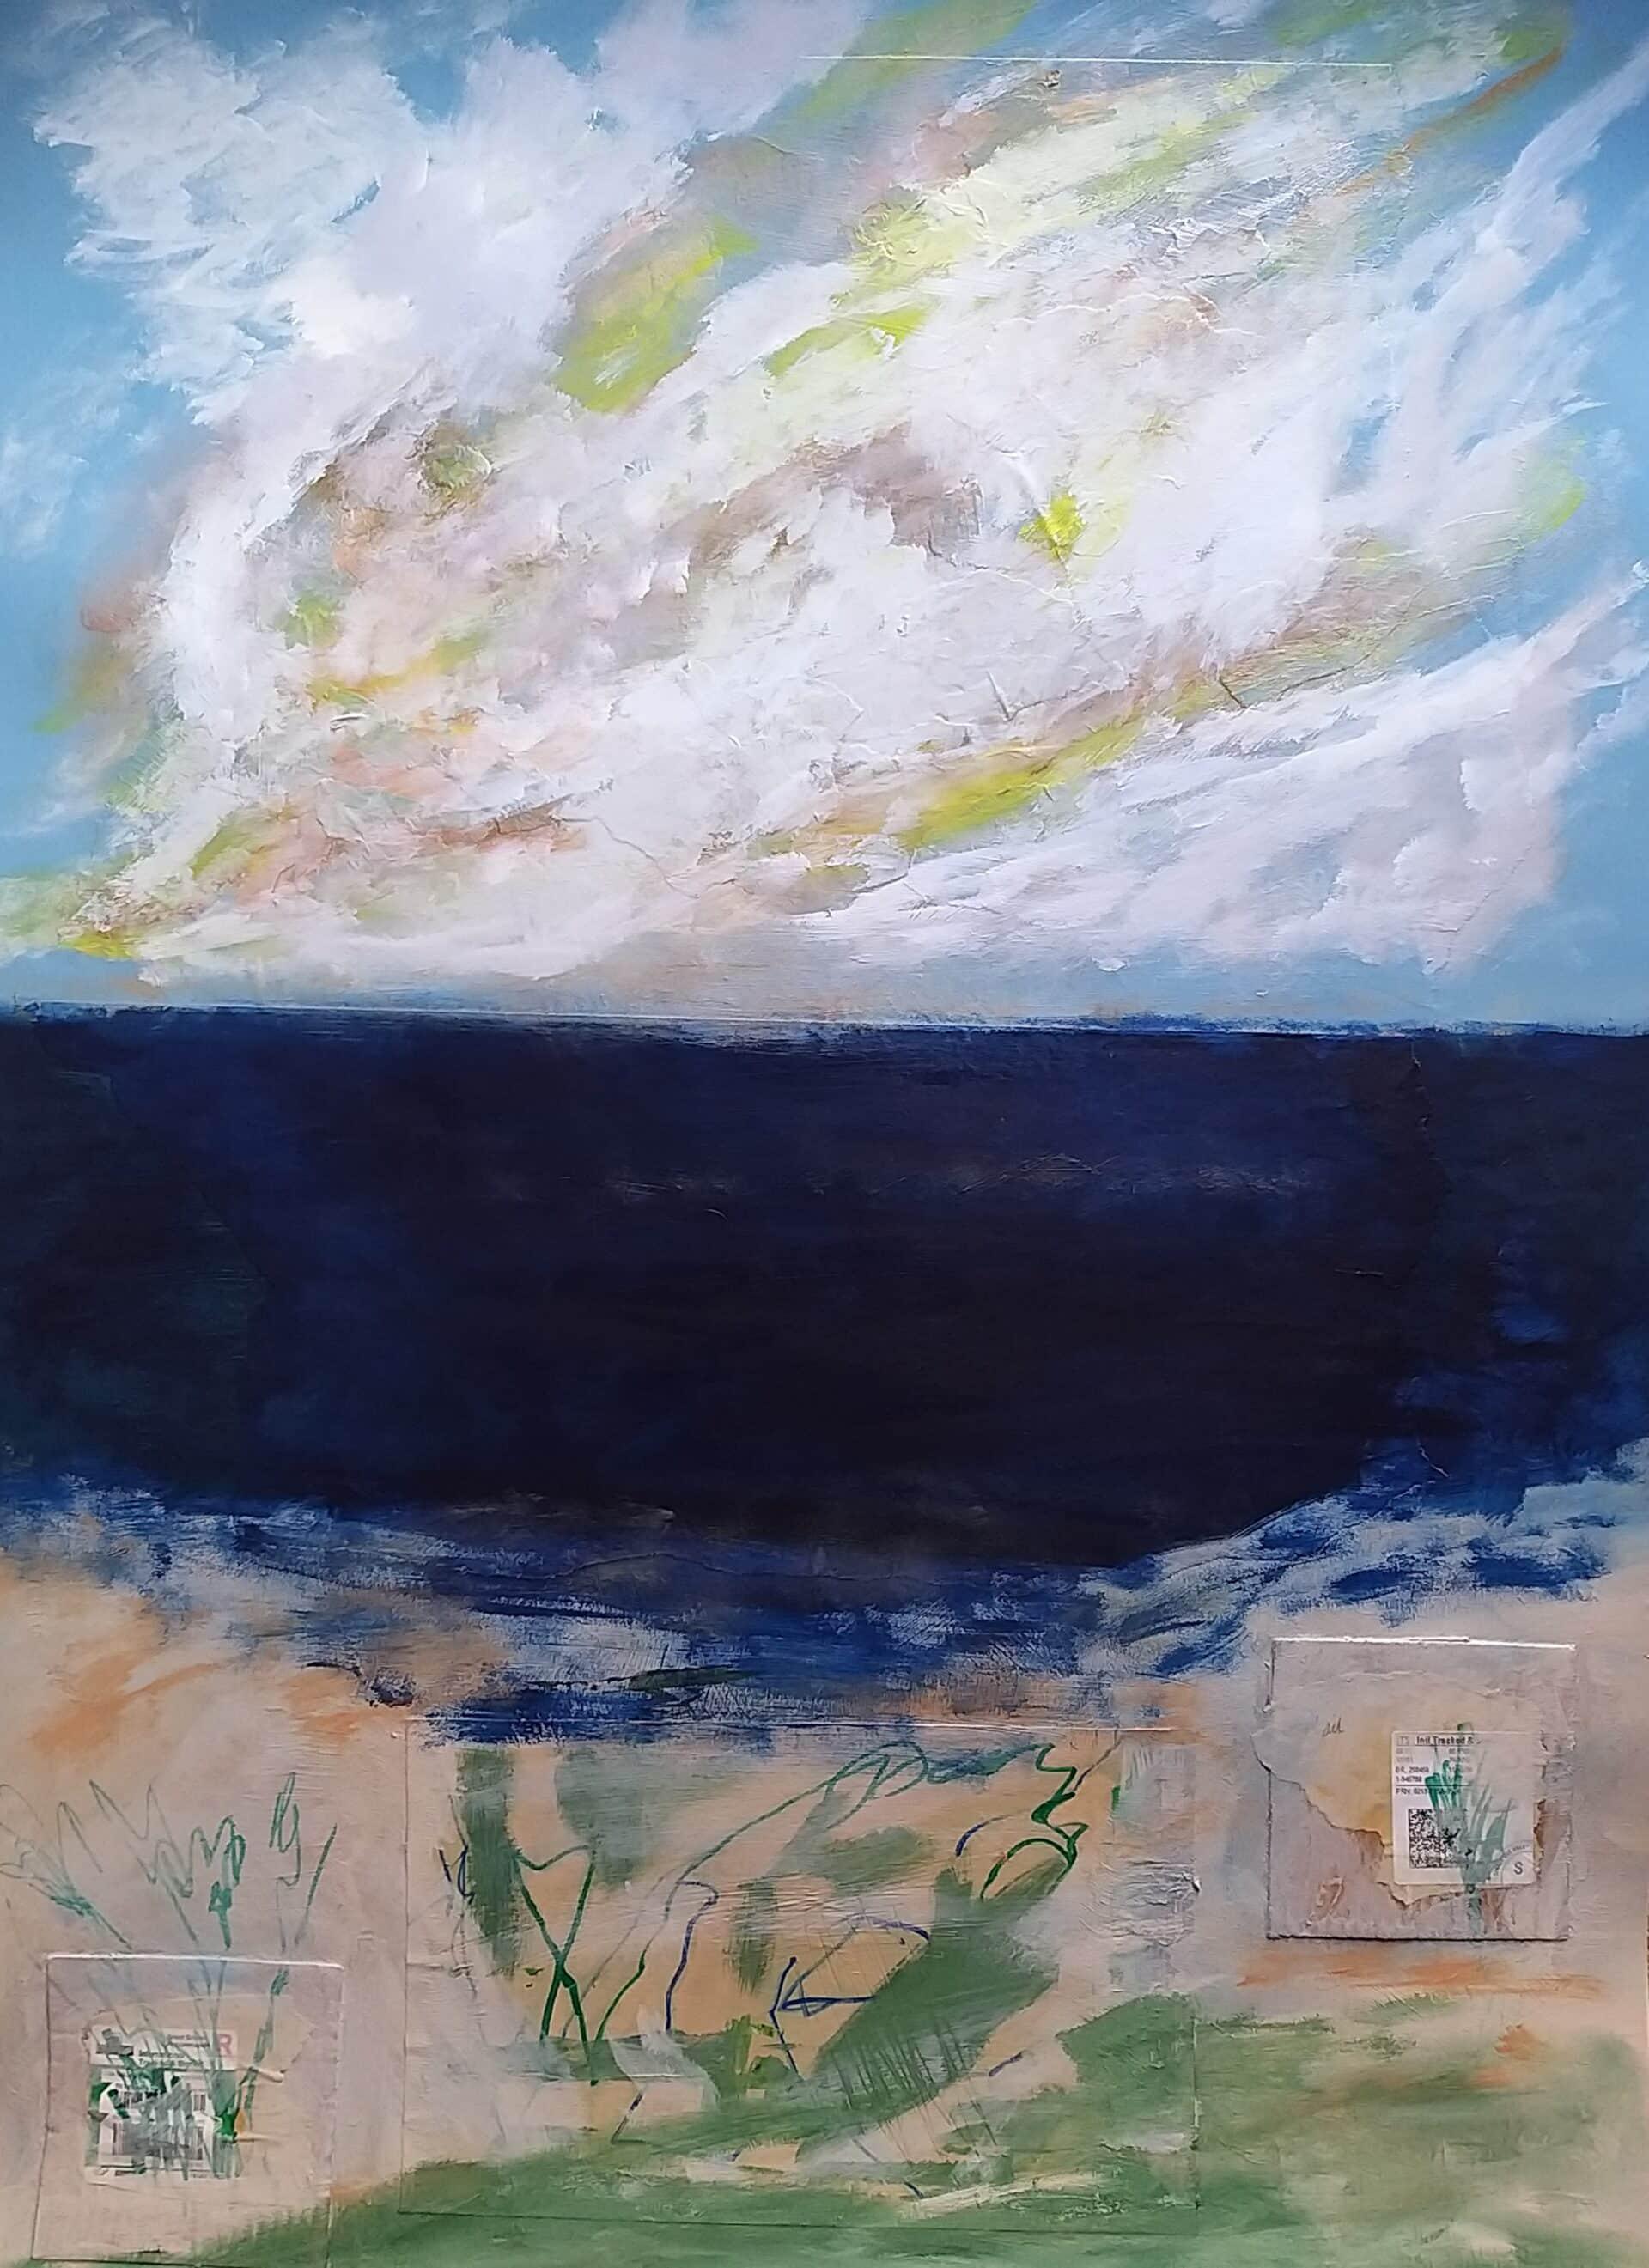 Earth Water & Sky